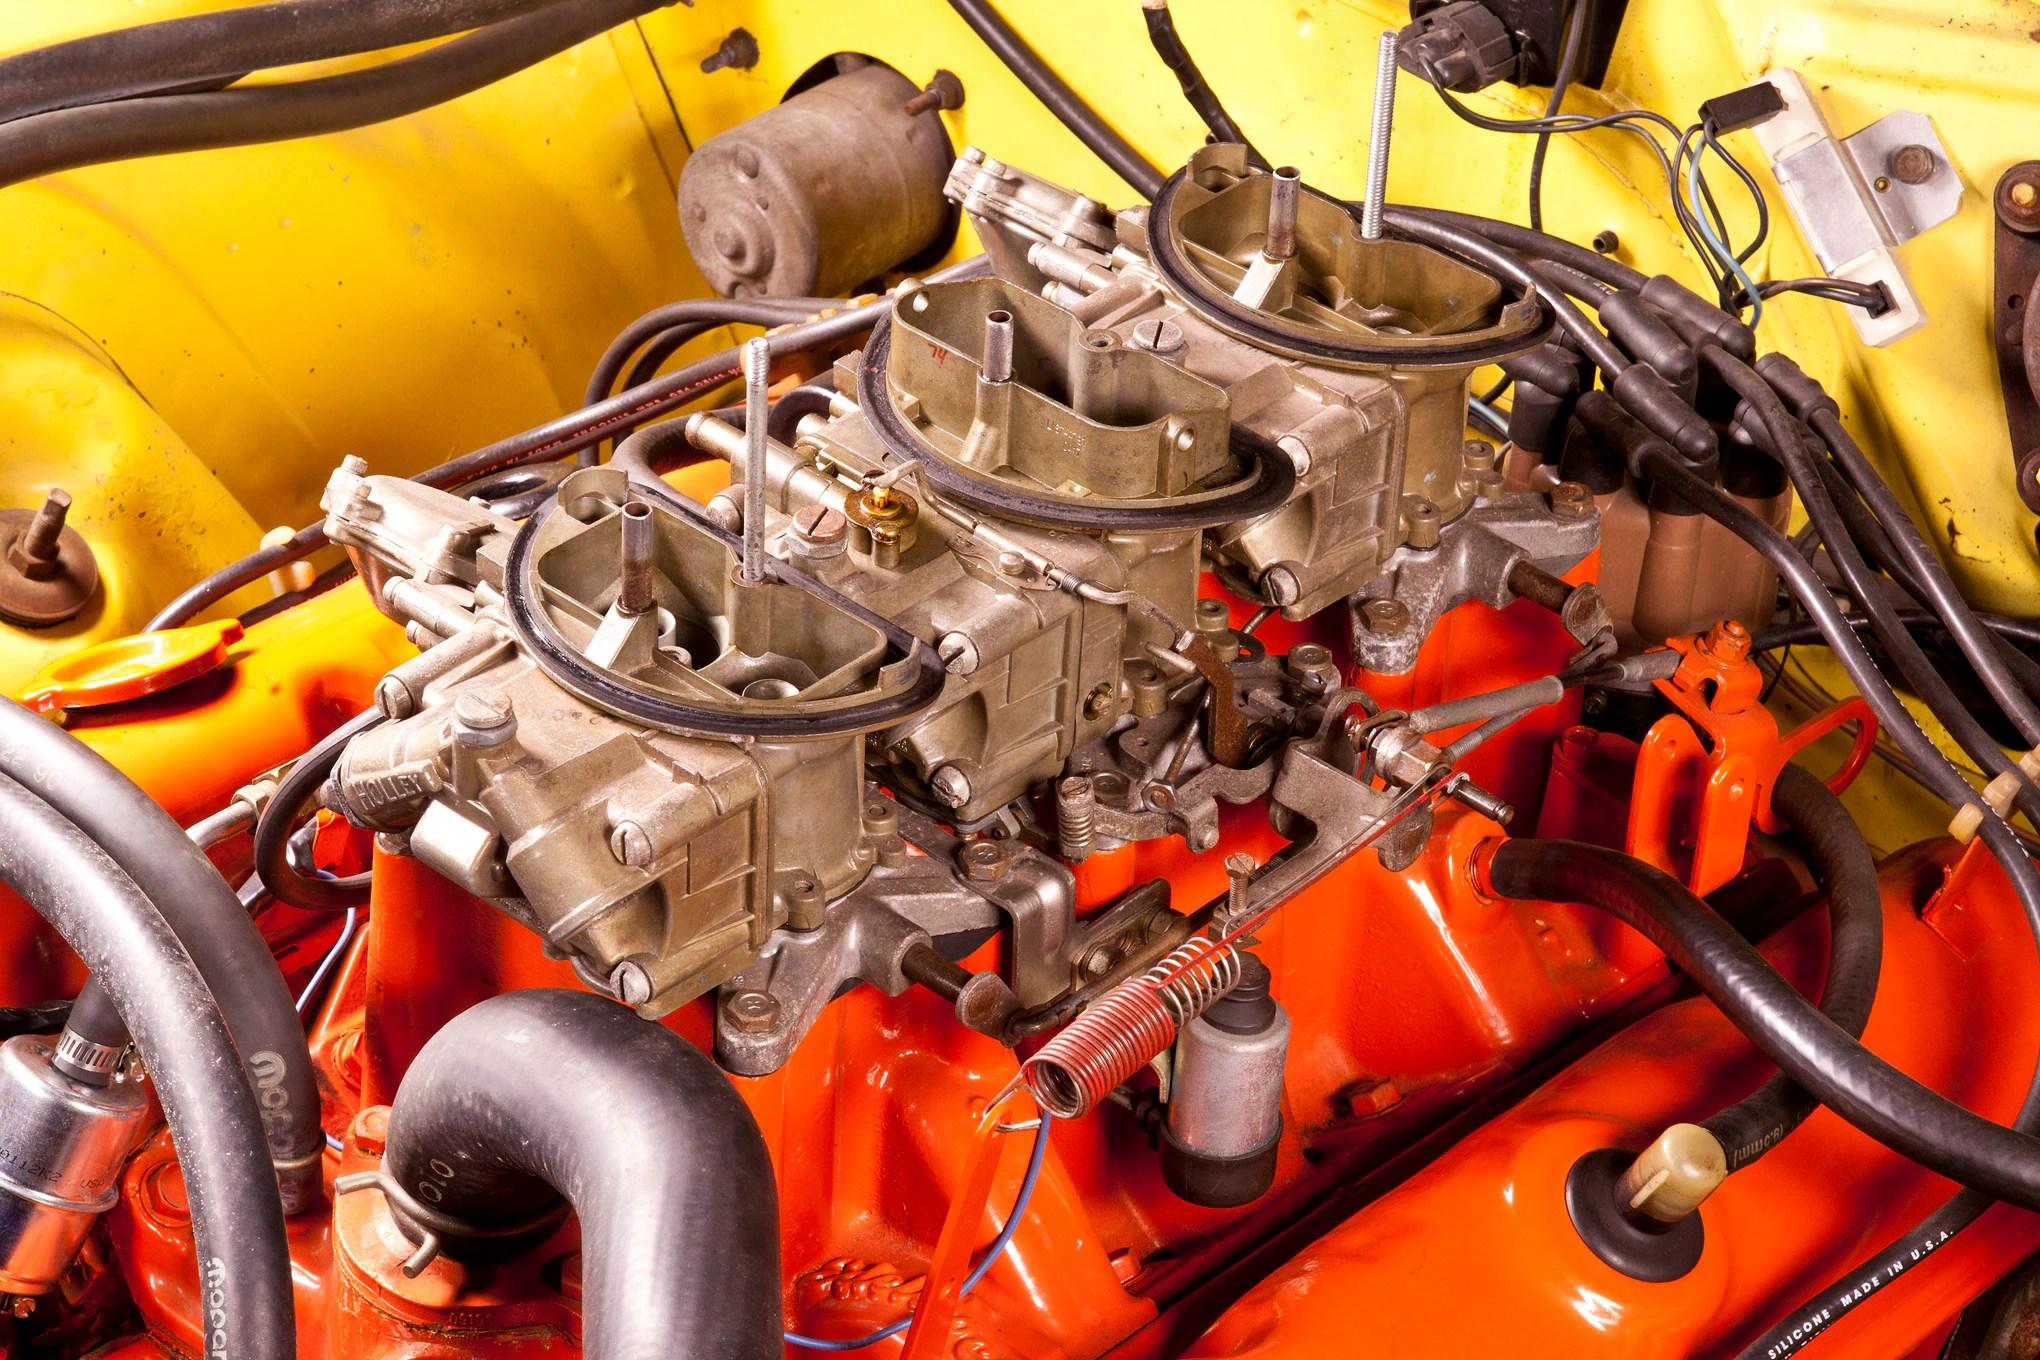 1971 Dodge Wiring Diagram Strip Survivor Bill Worley S 1970 Aar Plymouth Baracuda